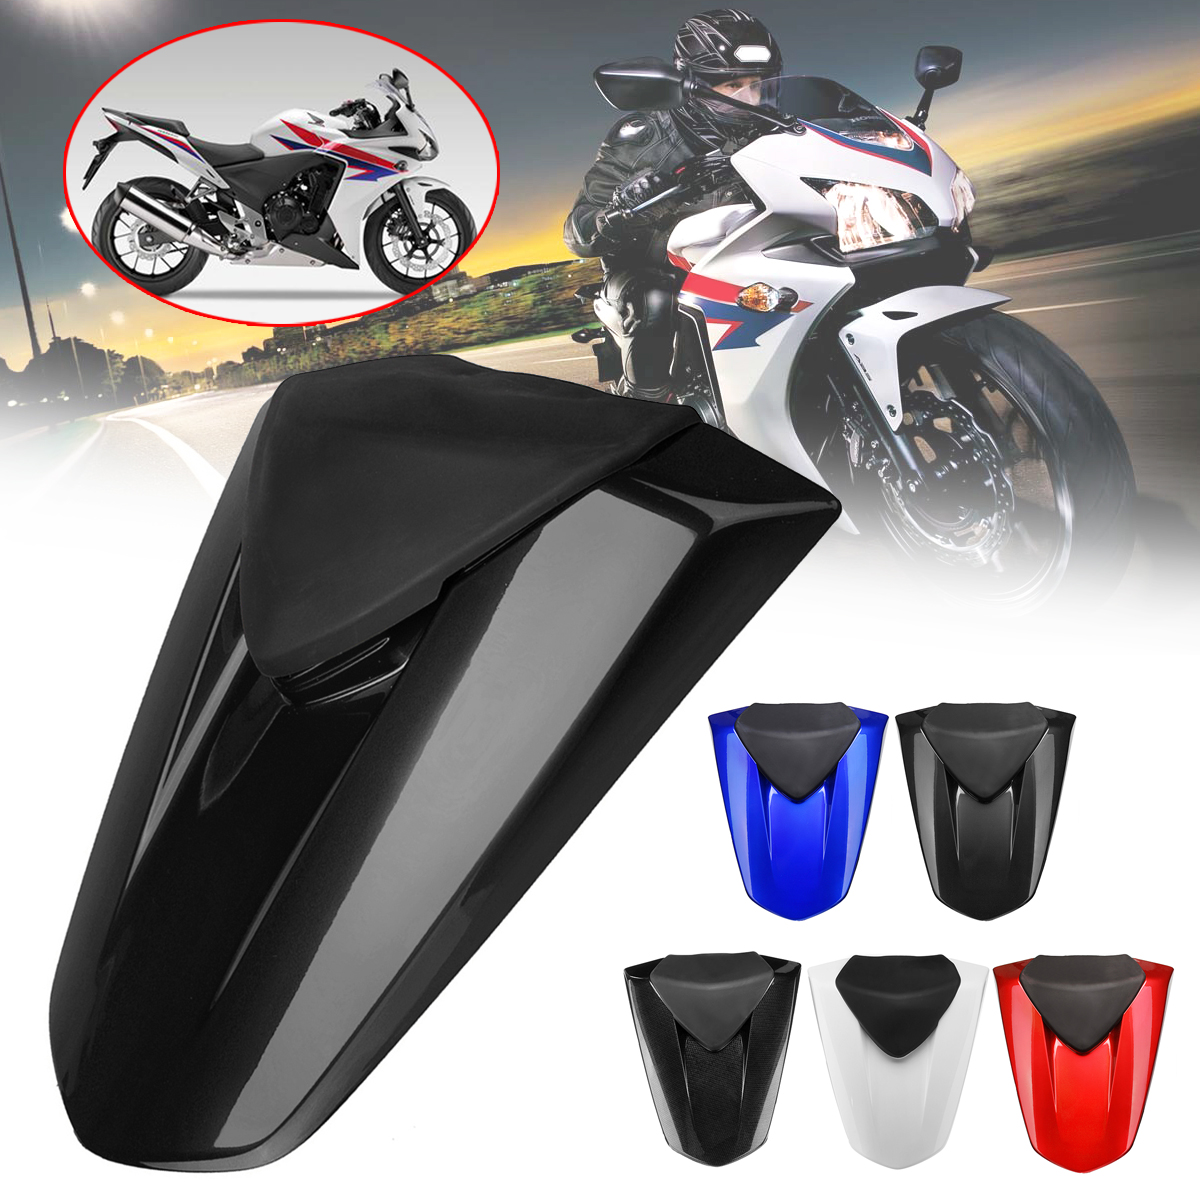 Motorcycle Rear Pillion Seat Cowl Fairing Cover Passenger Seat Pillion Cowl  ABS Plastic for Honda CBR500R CBR 500R 2013-2015